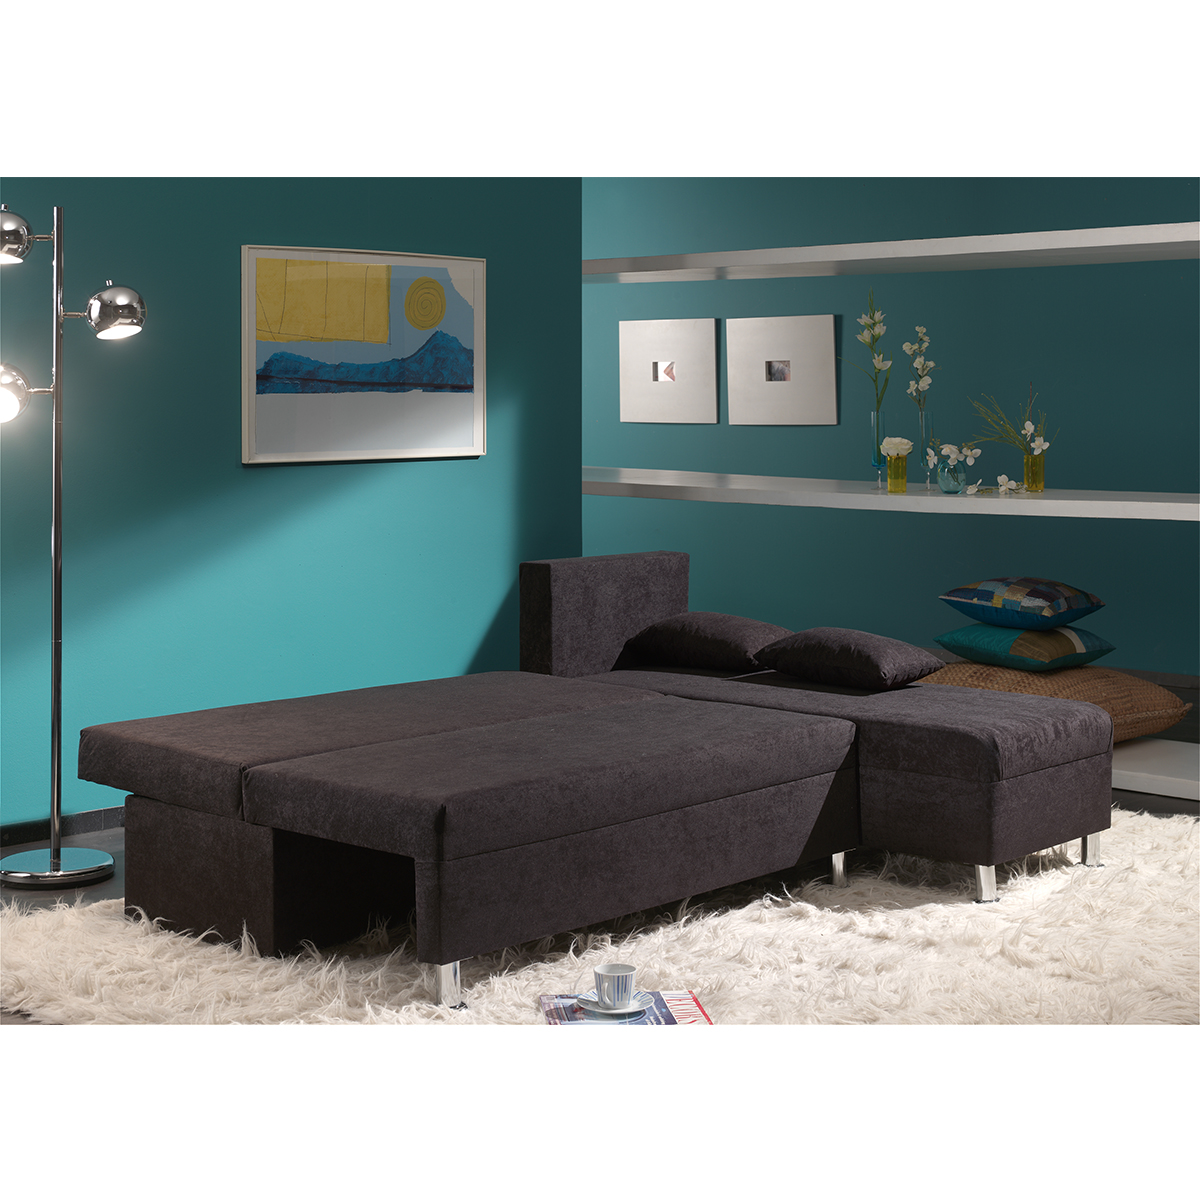 colmar die kompakte polstergarnitur online kaufen moebel trend 24. Black Bedroom Furniture Sets. Home Design Ideas